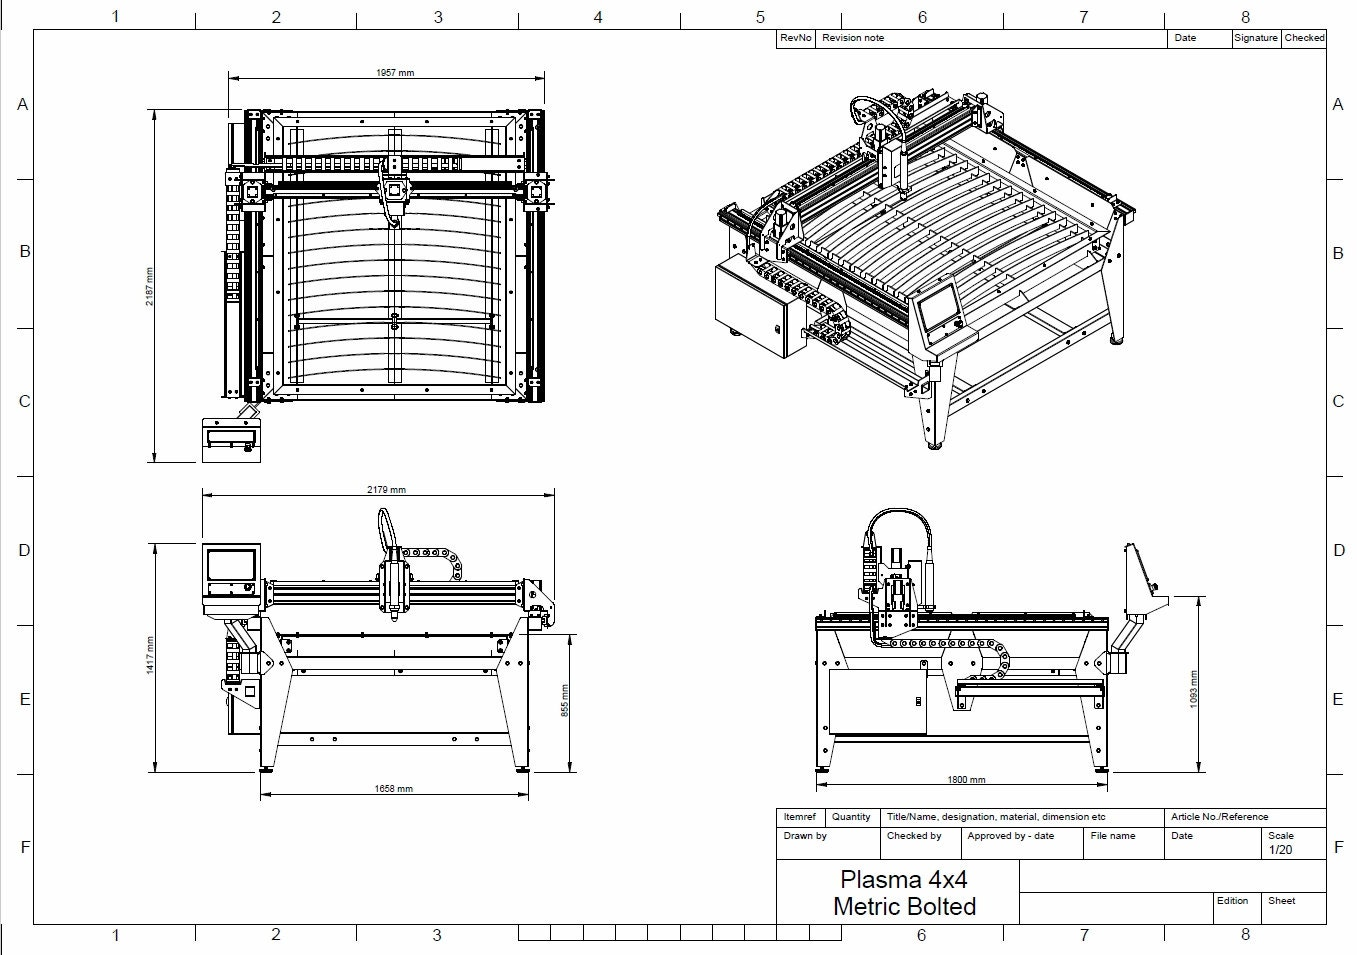 1250mm x 1250mm  4x4 feet  cnc plasma table diy plans from diyplansbymichael on etsy studio